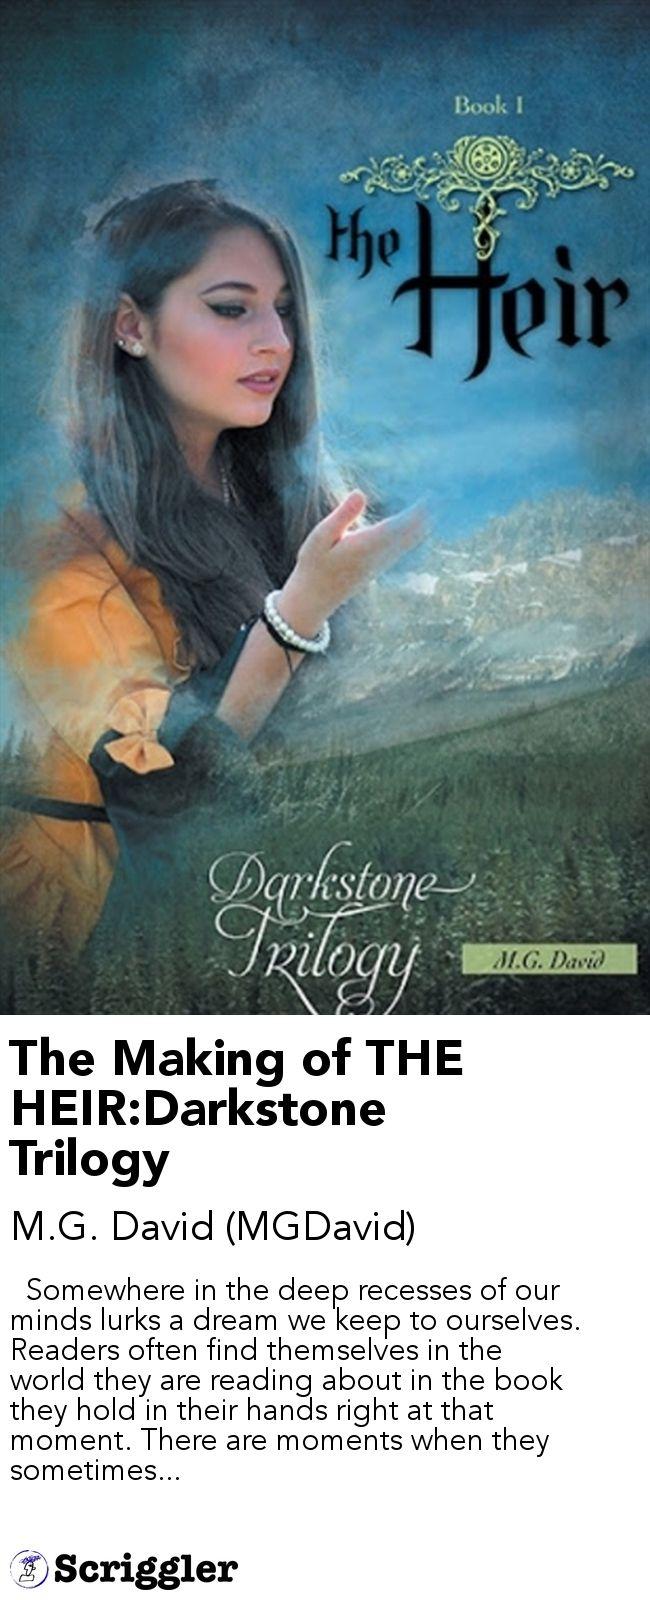 The Making of THE HEIR:Darkstone Trilogy by M.G. David (MGDavid) https://scriggler.com/detailPost/story/45252